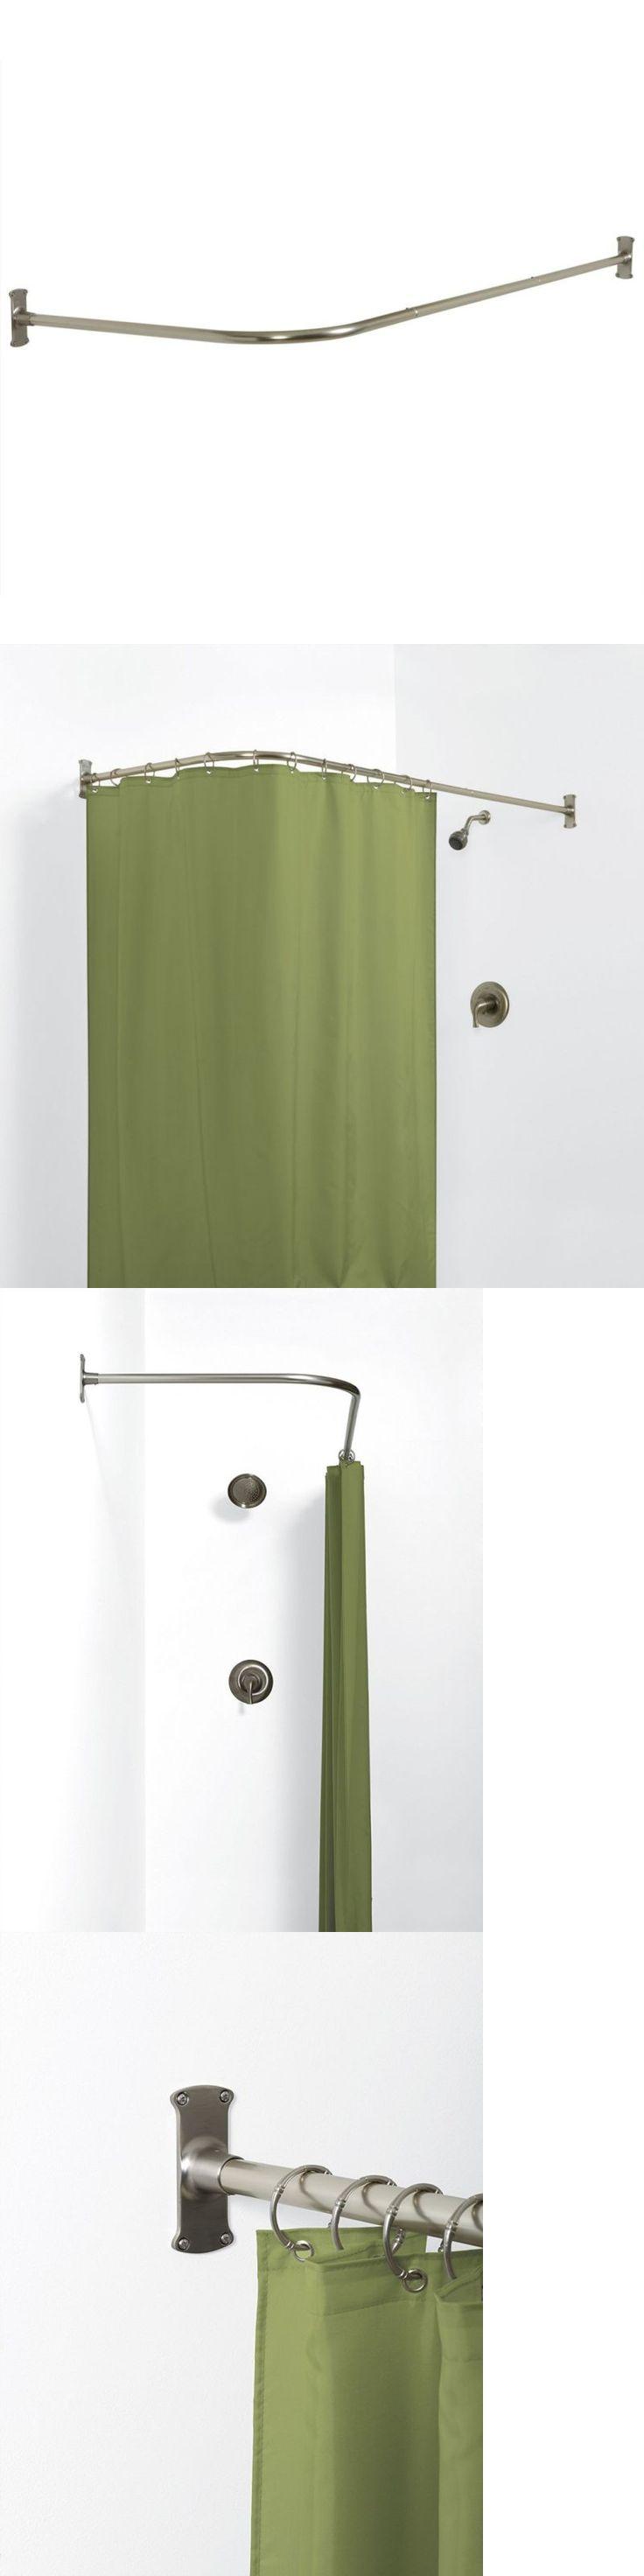 best 20 corner curtain rod ideas on pinterest corner window shower curtain rods 168132 zenna home 33941bn neverrust aluminum l shaped corner shower curtain